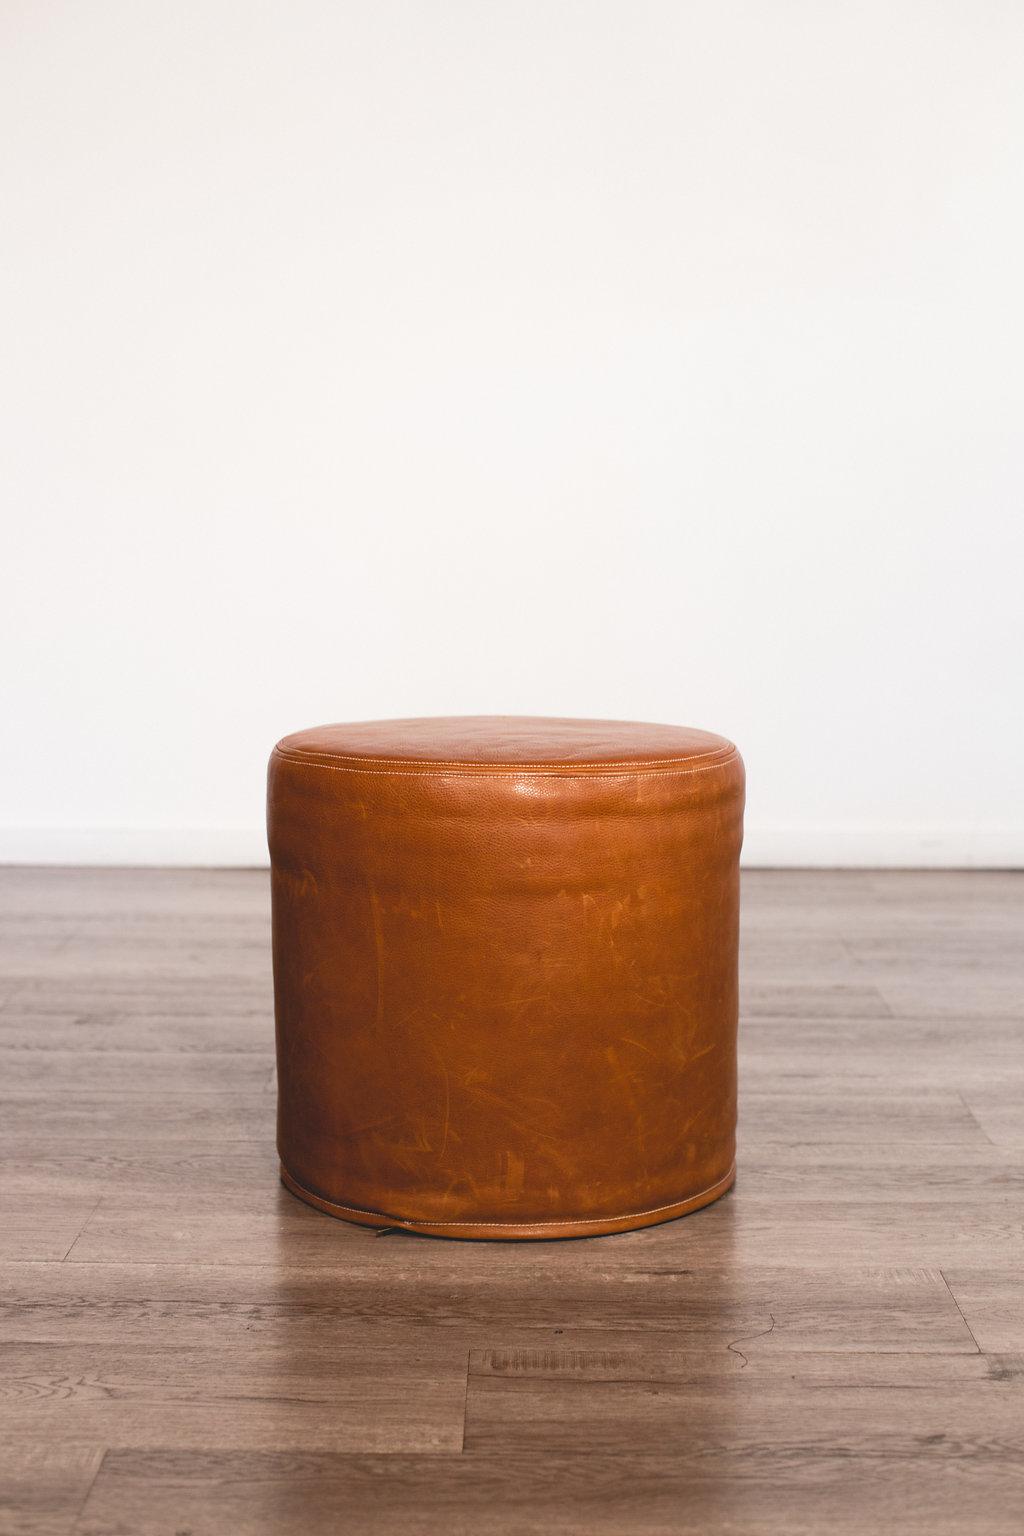 Brown Leather Ottoman Quantity: 1 Price: $60